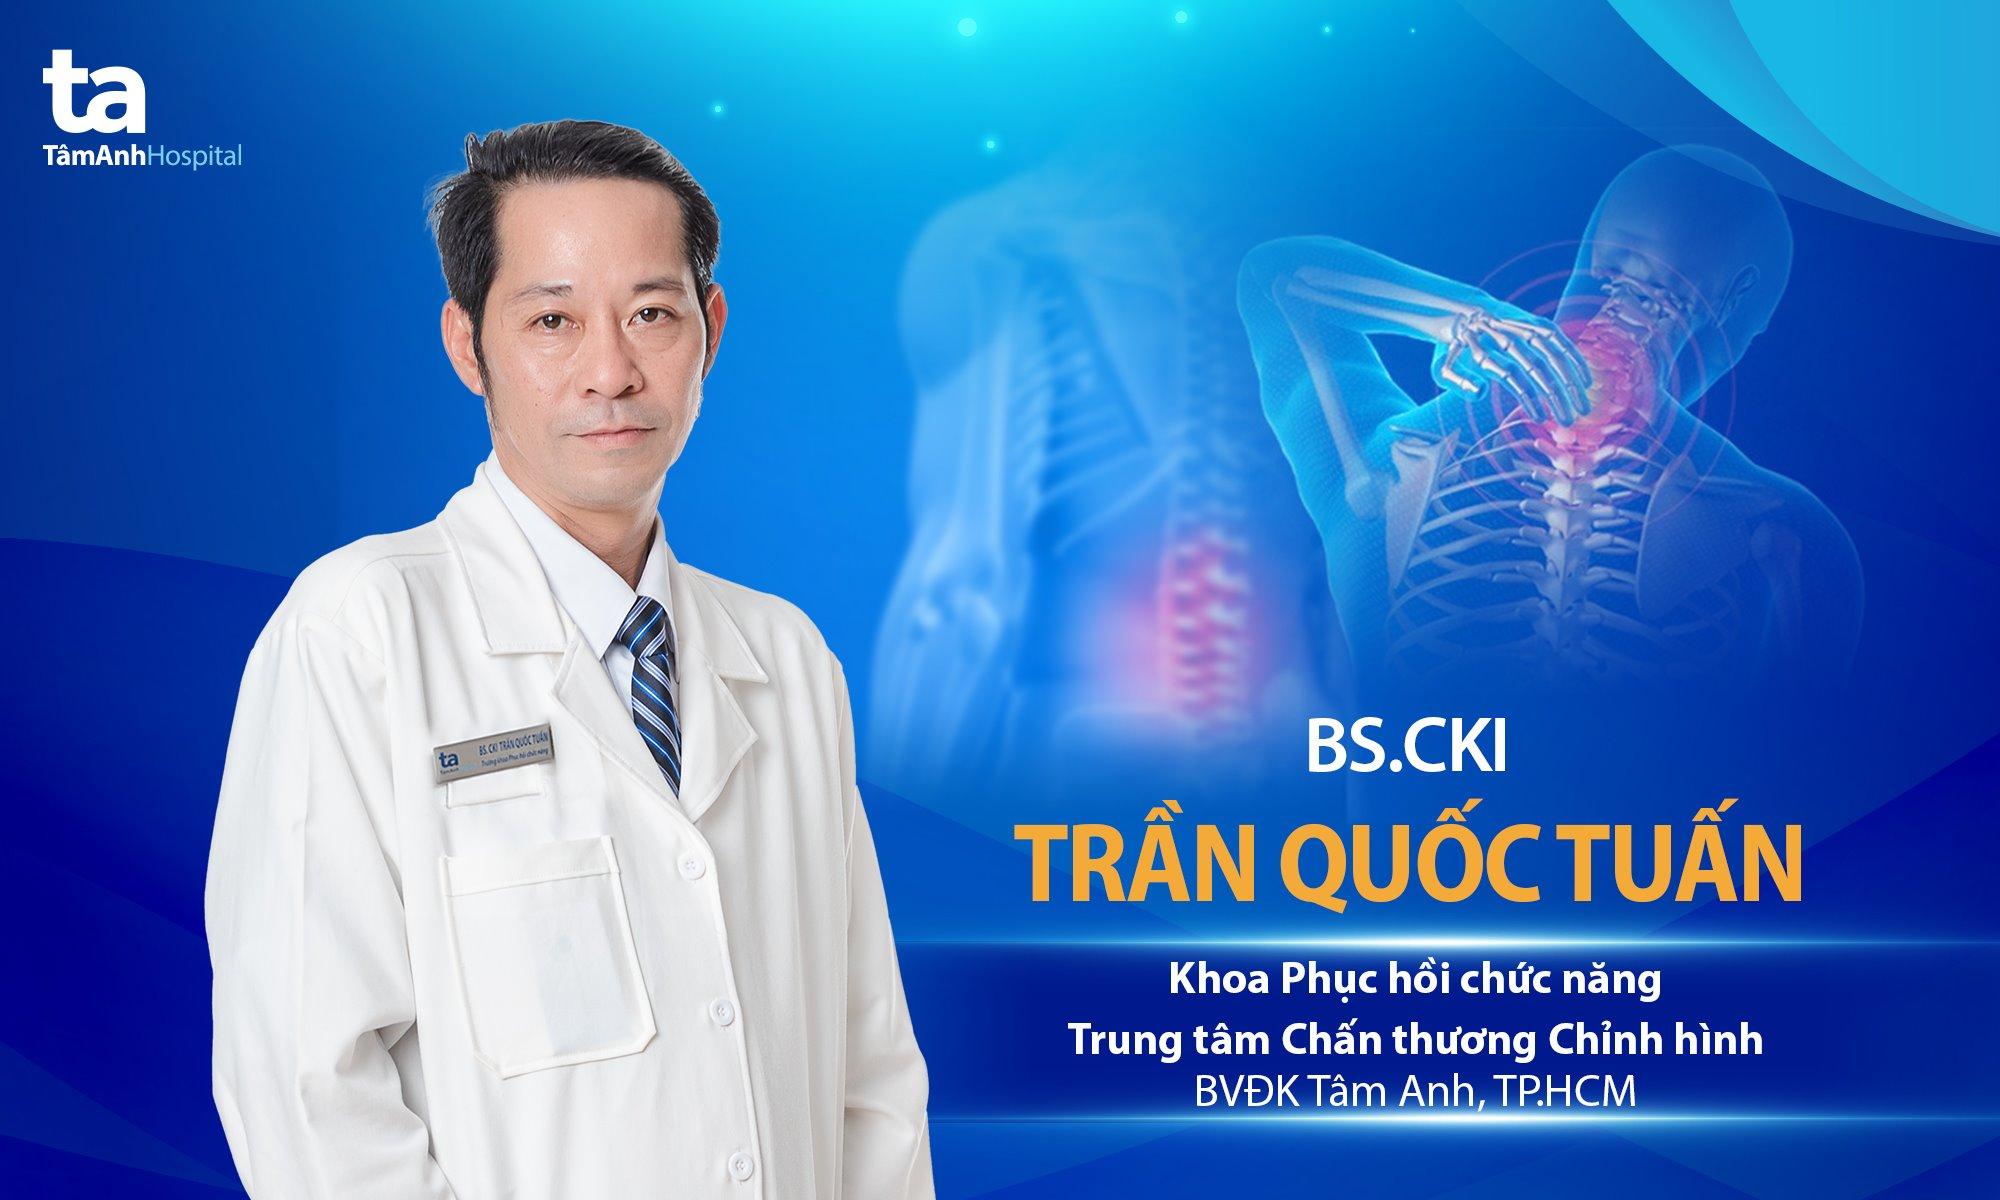 BS.CKI Trần Quốc Tuấn